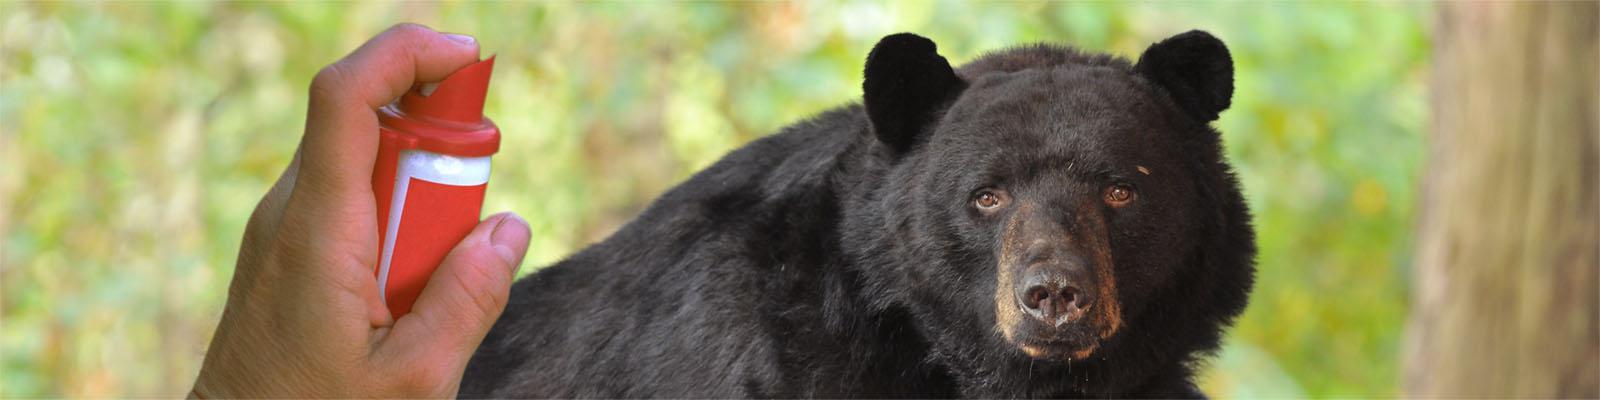 Does Pepper Spray Make Bears Mad? - North American Bear